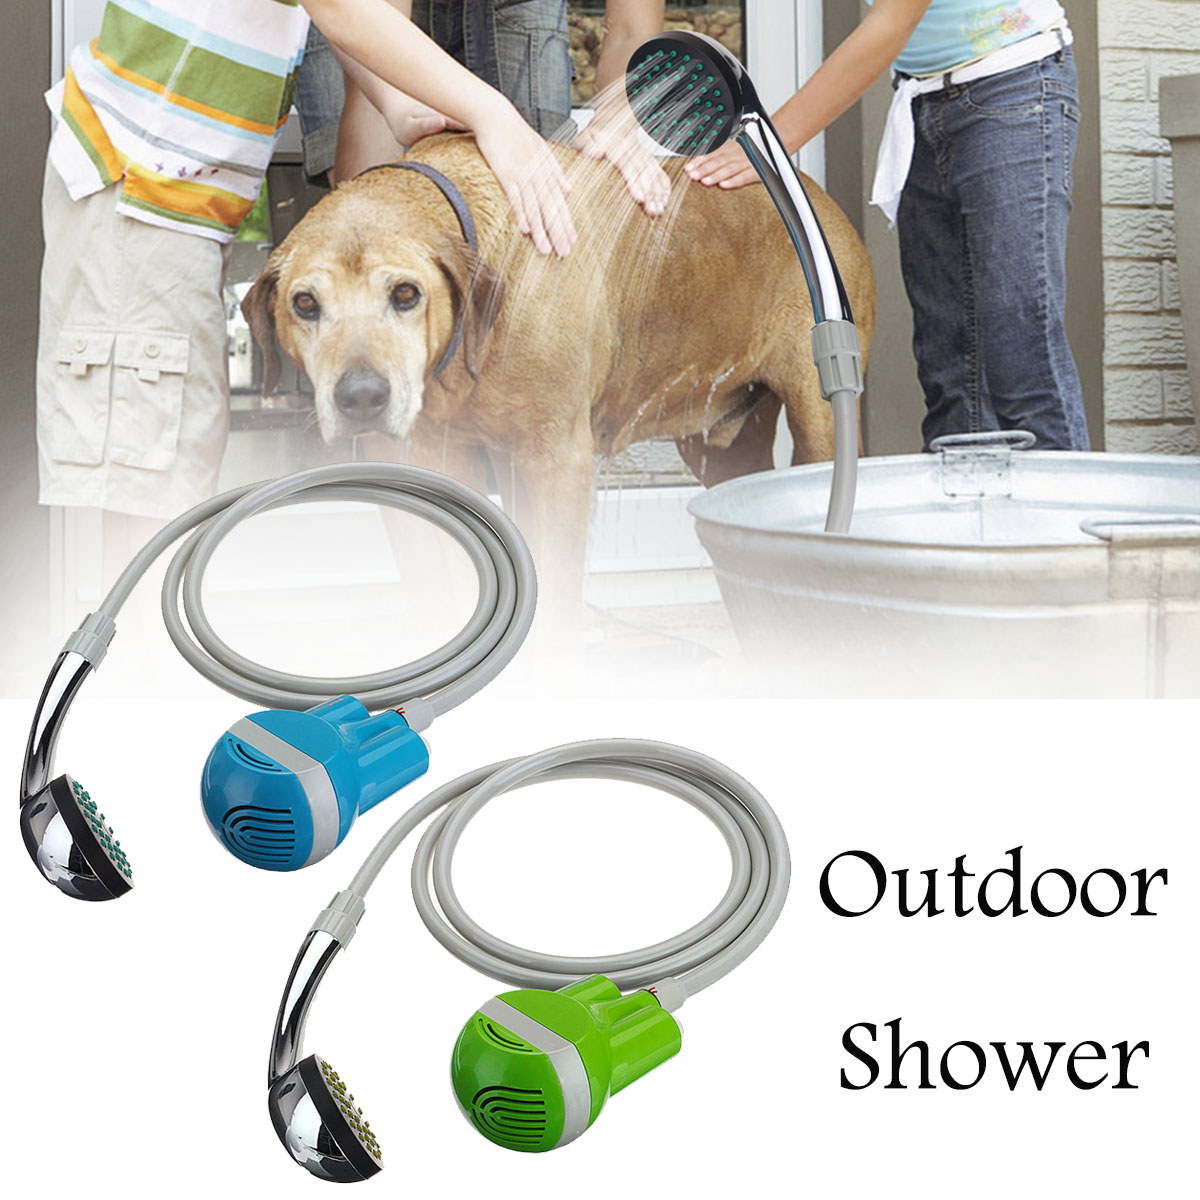 Portátil al aire libre Camping coche ducha senderismo viaje portátil batería alimentación USB recargable hogar Baño ducha de agua